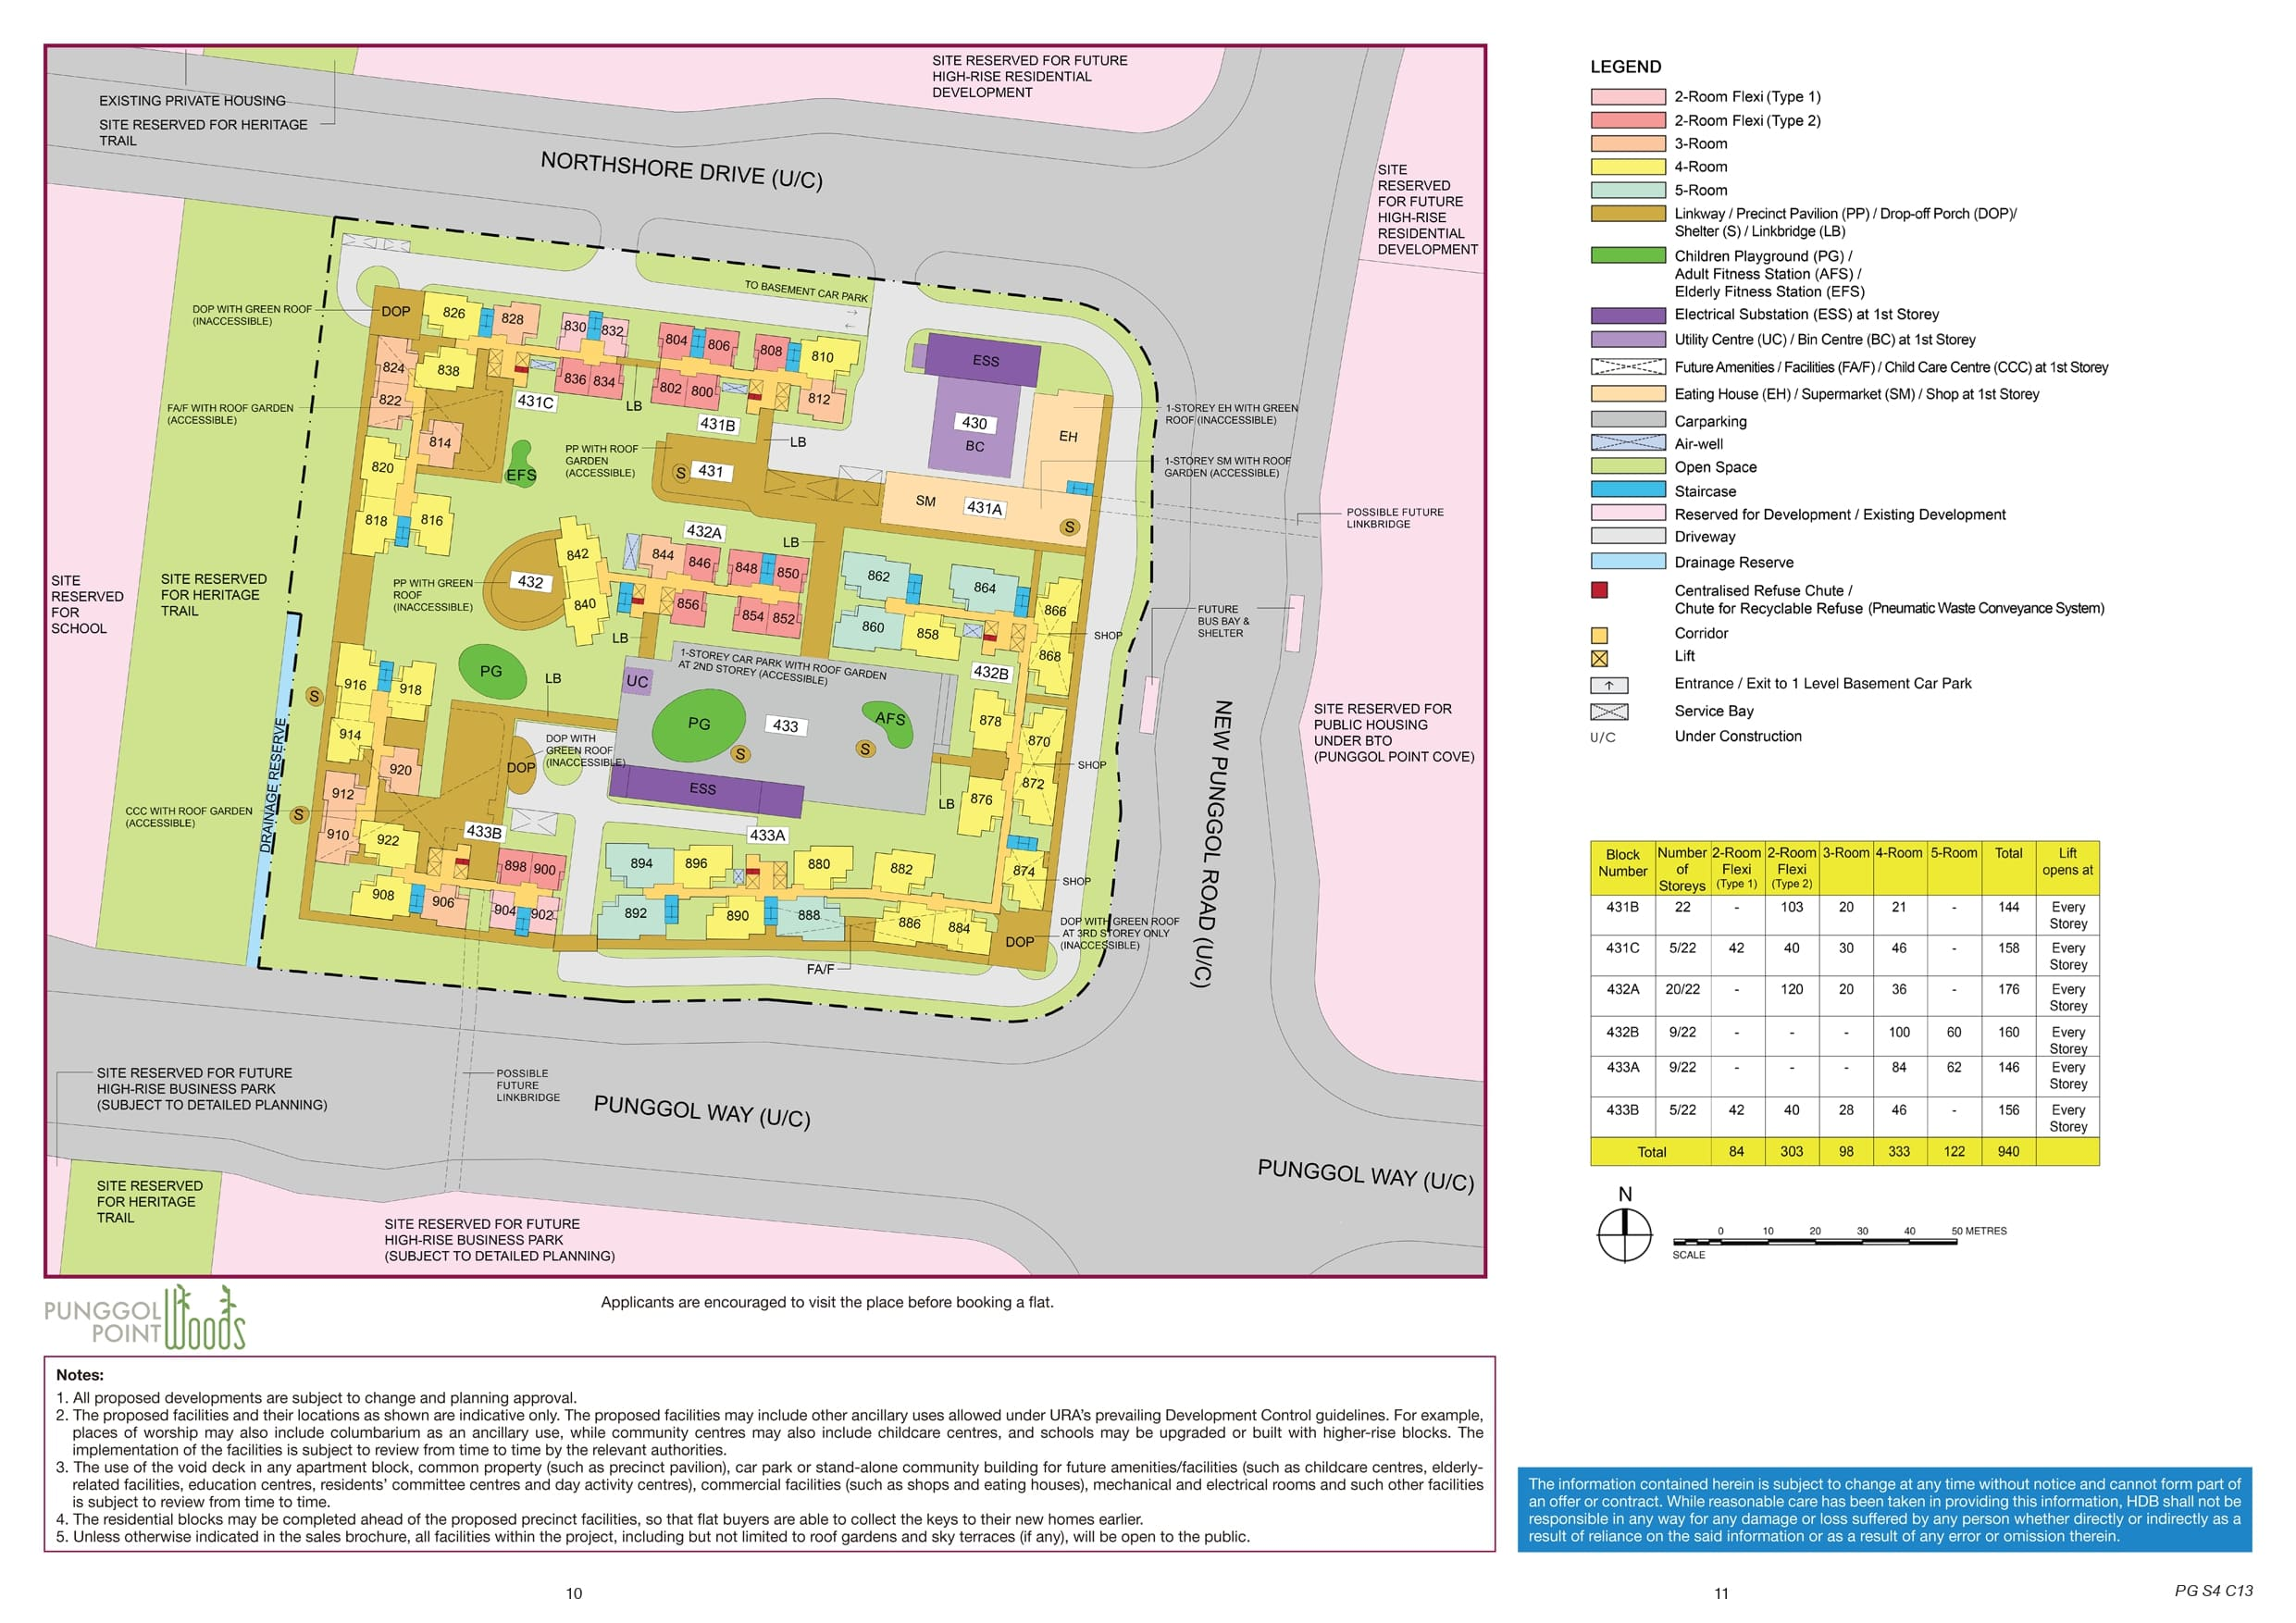 Punggol Point Woods Site Plan